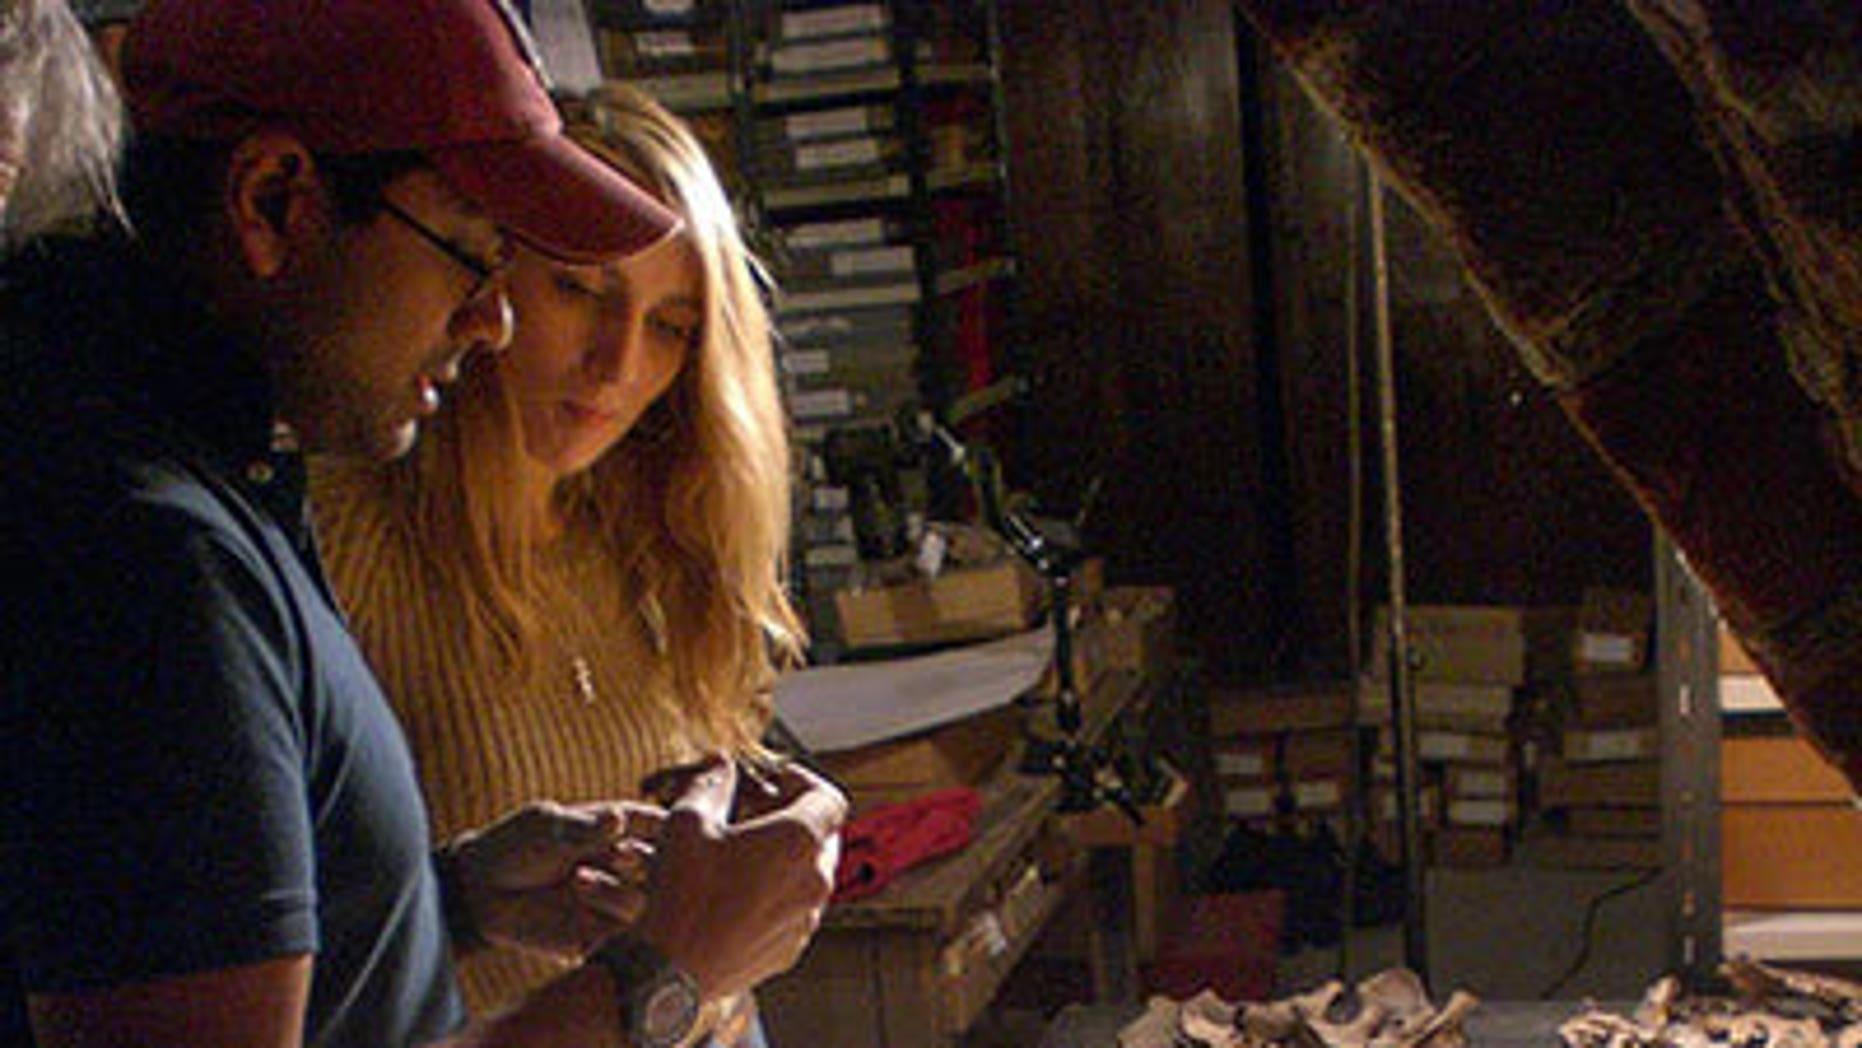 Stanford Assistant Professor Krish Seetah and Reading University student Rose Calis analyze animal bones in the basement of Riga Castle, Latvia.